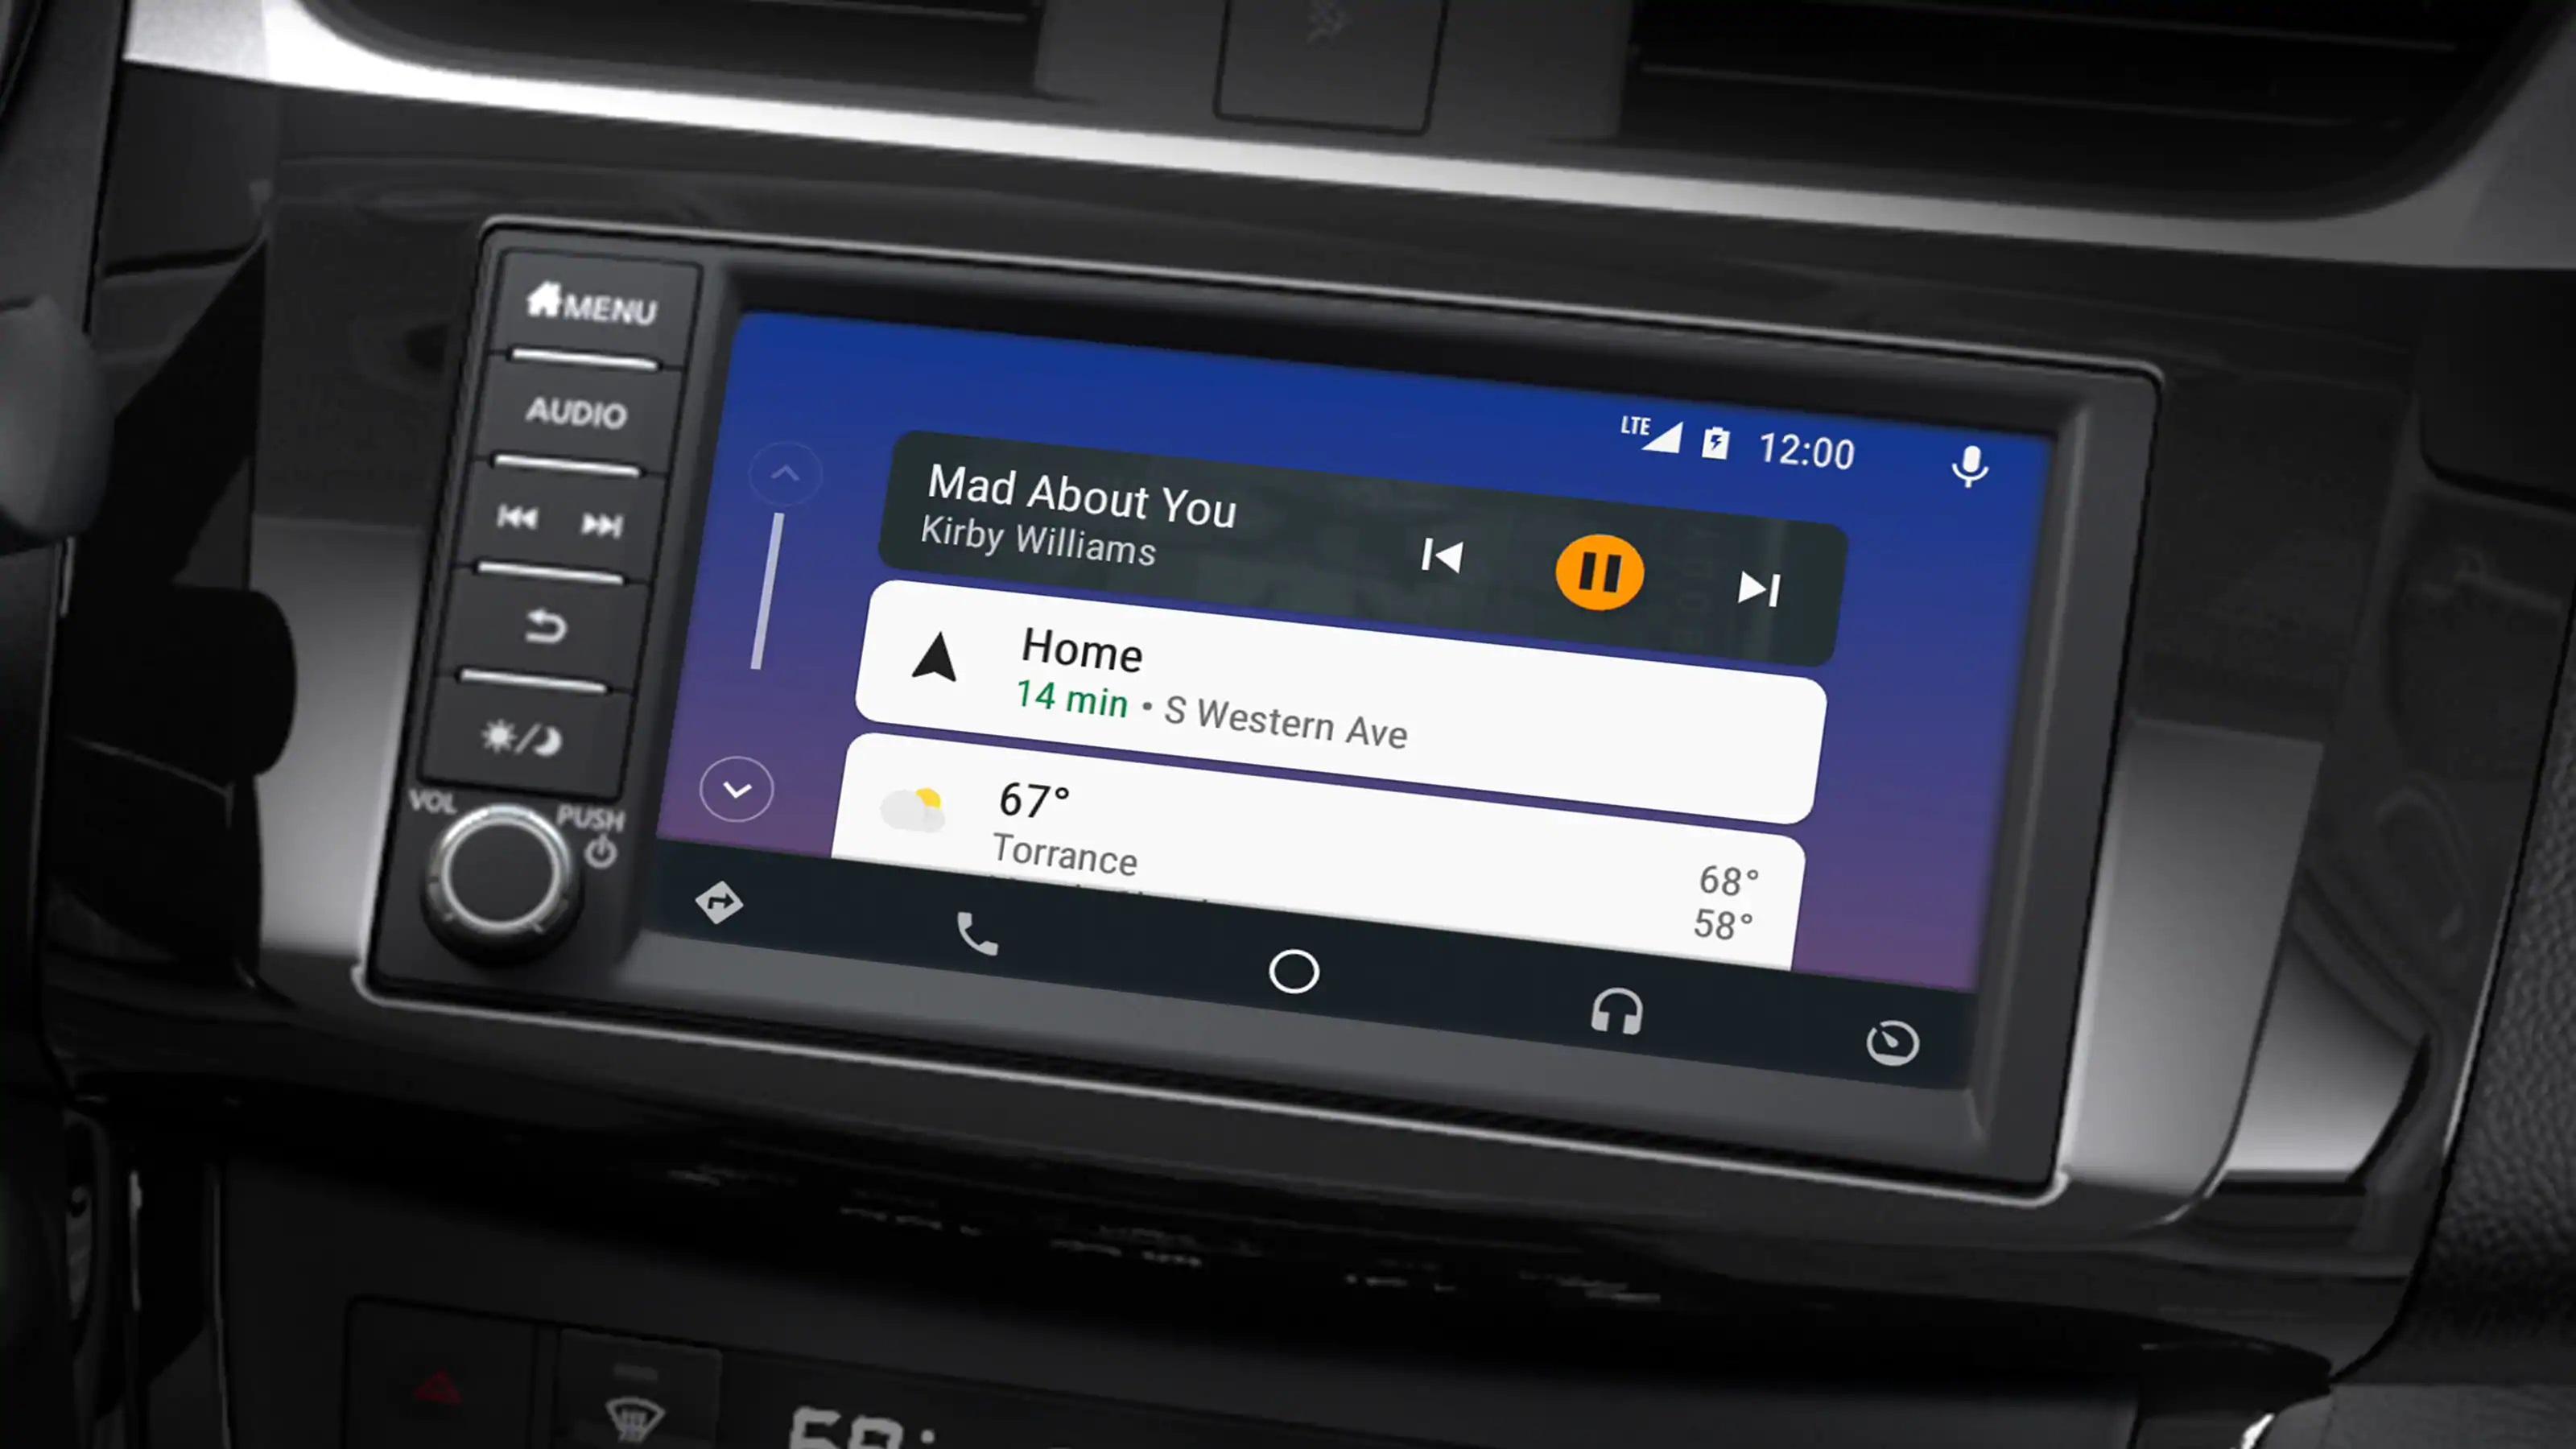 2019 Nissan Sentra Touchscreen